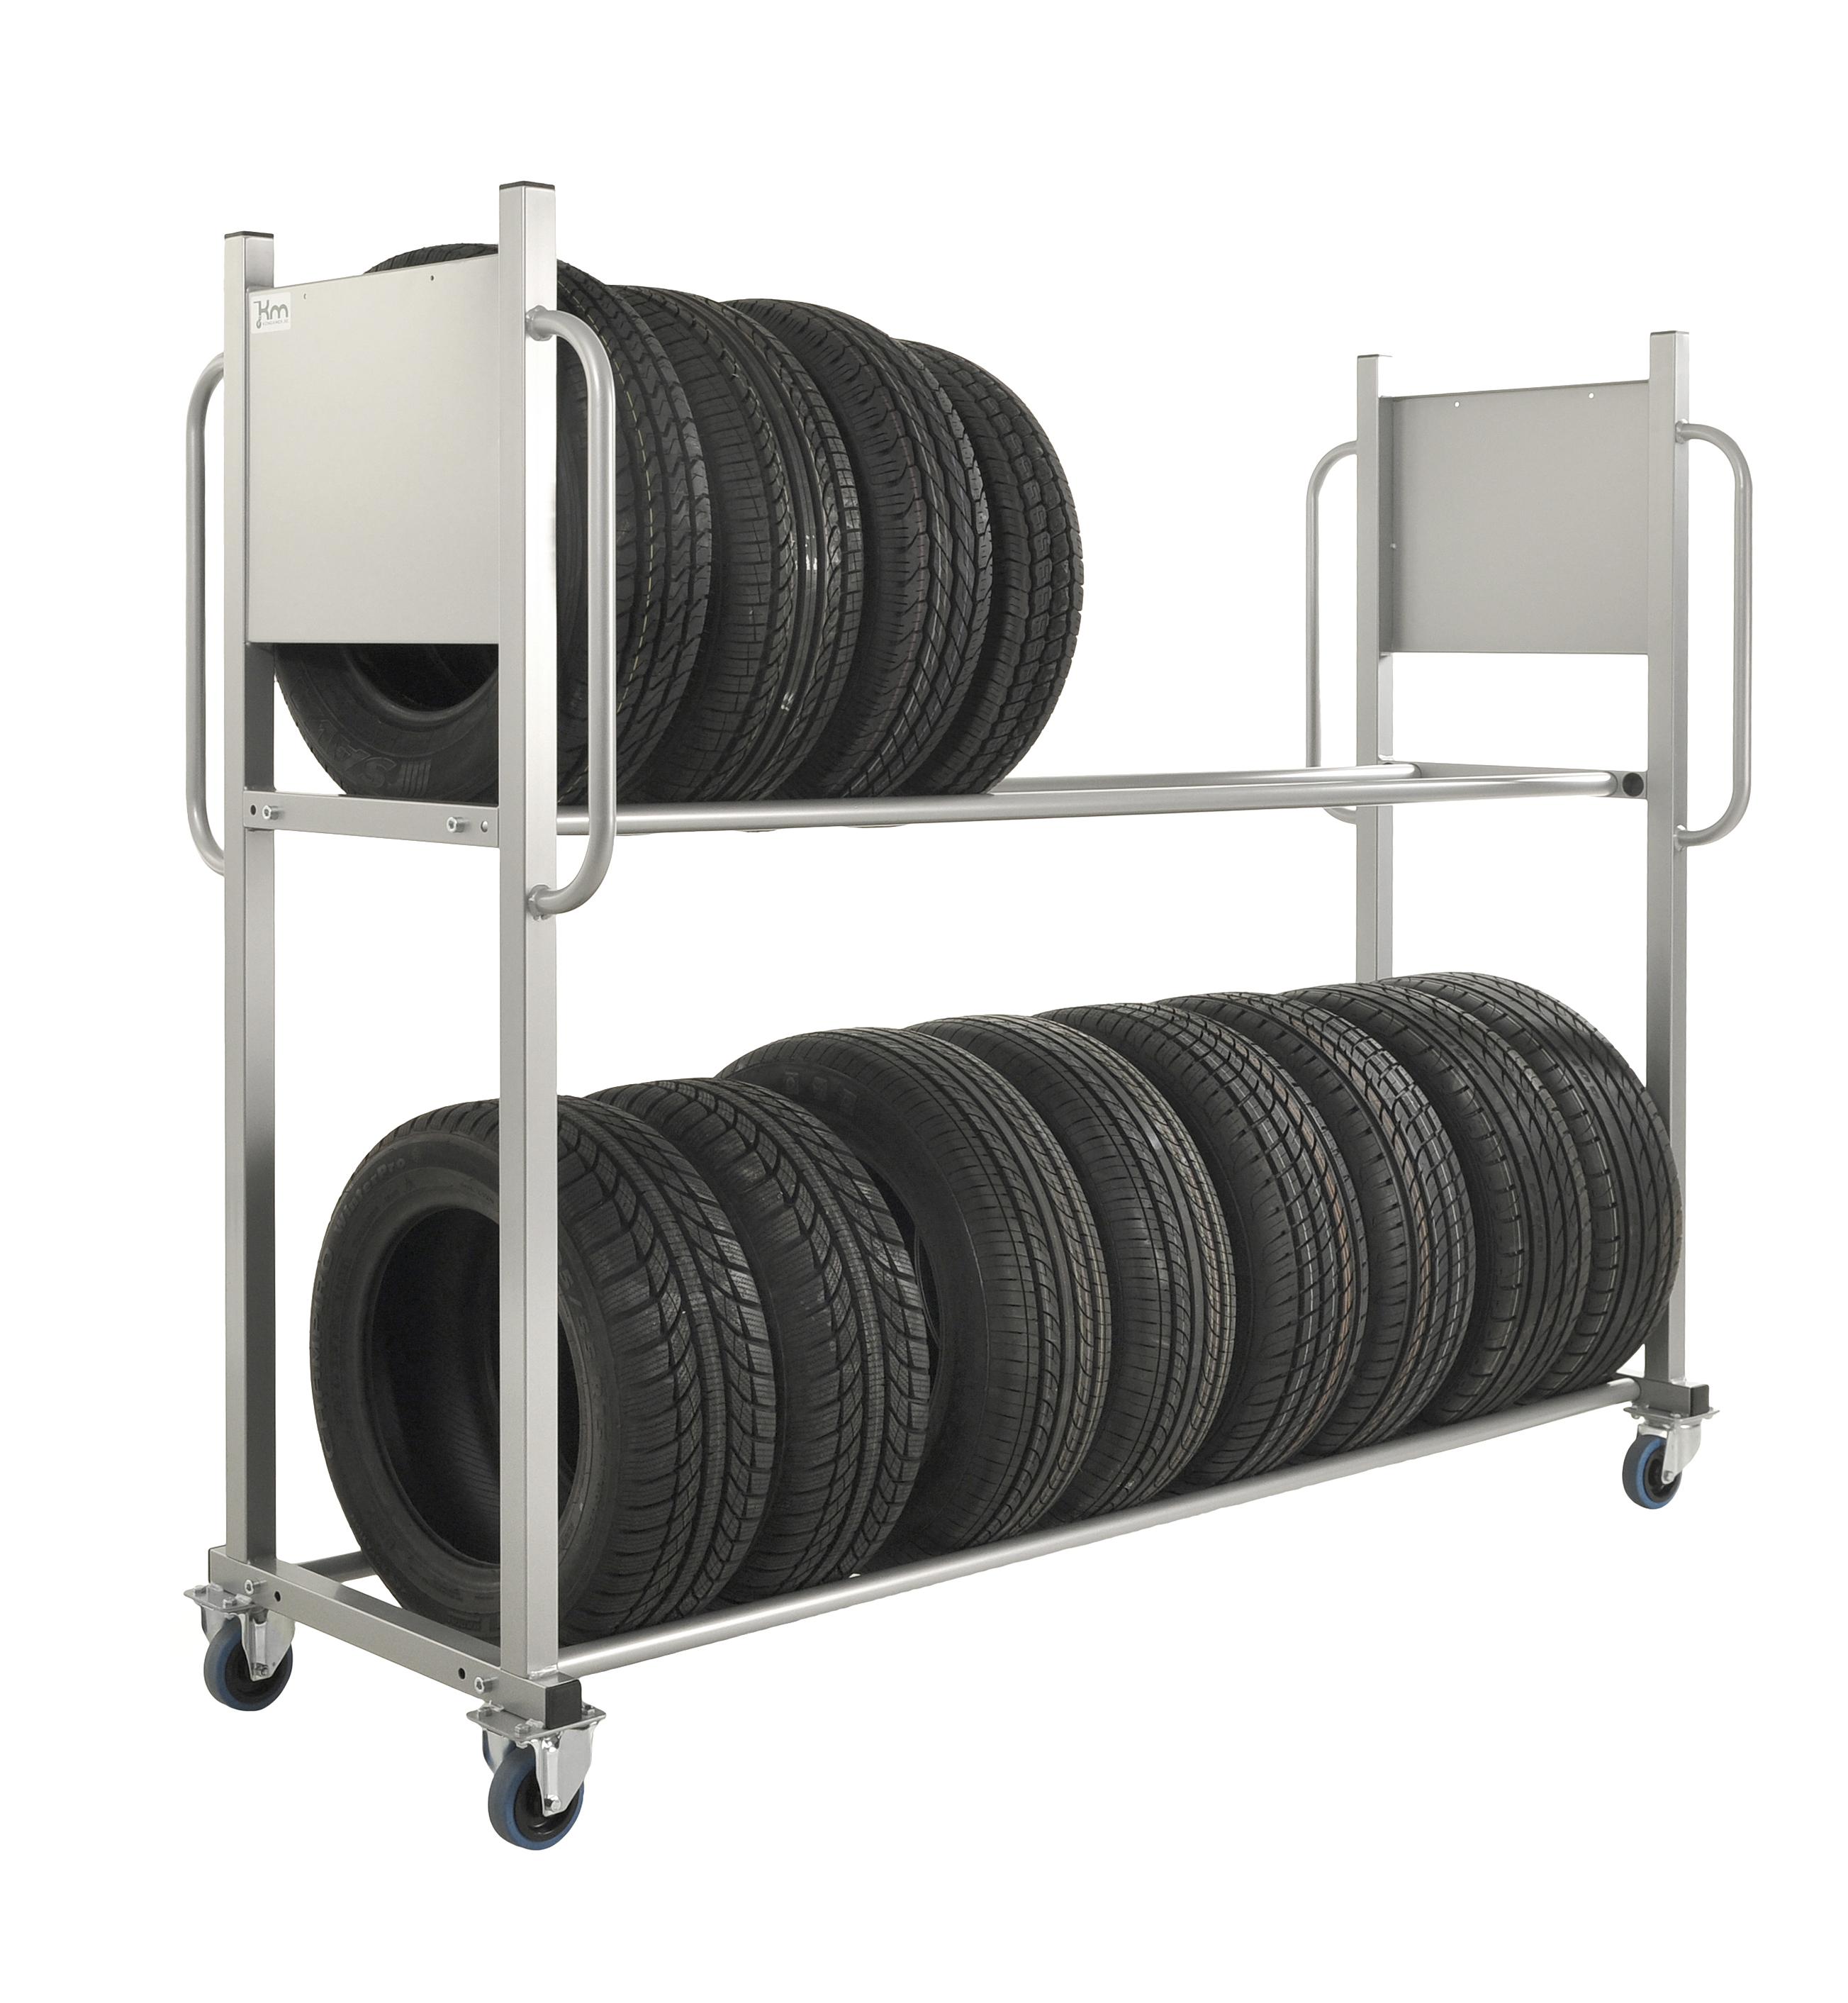 Tire handling KMD3B